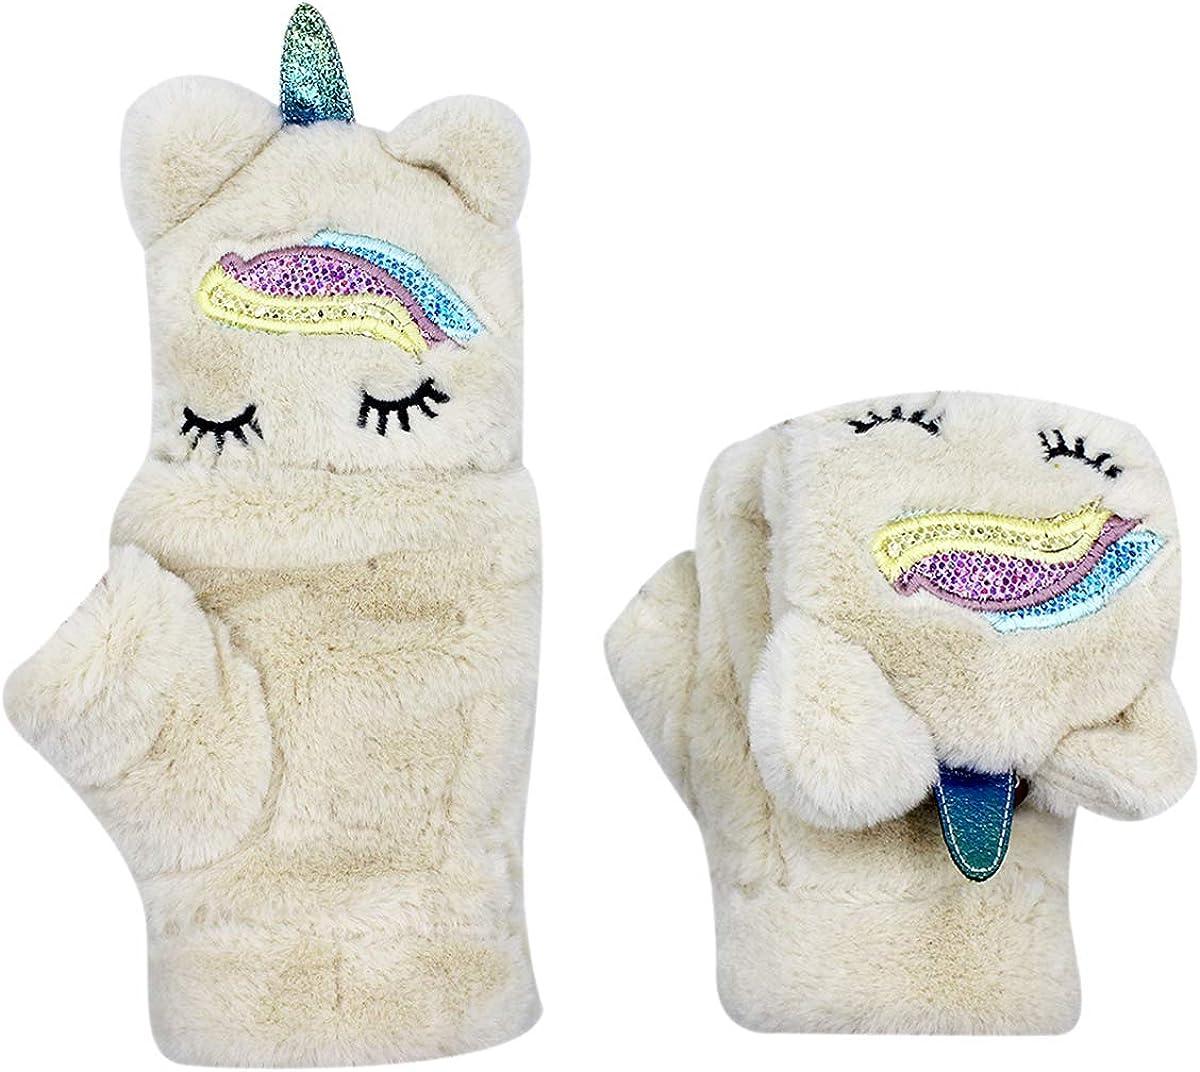 Winter Warm Gloves Mittens Cute Unicorn Windproof Fluffy Fleece Plush Flip Cover Gloves for Women Girls Boys